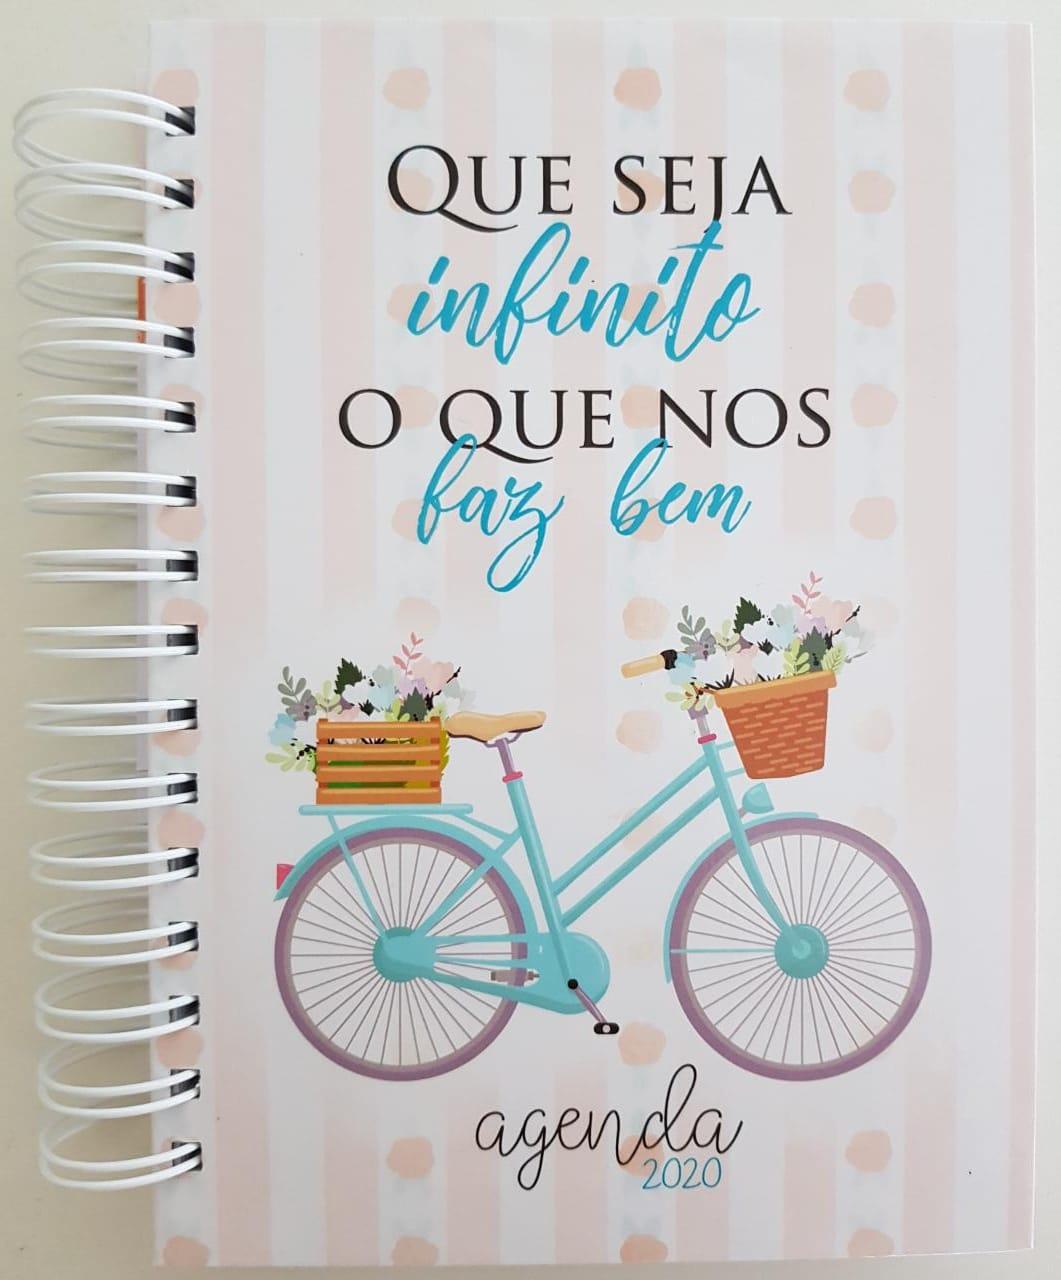 Agenda Bicicleta 2020 Espiral Capa Dura 360 folhas - Bike